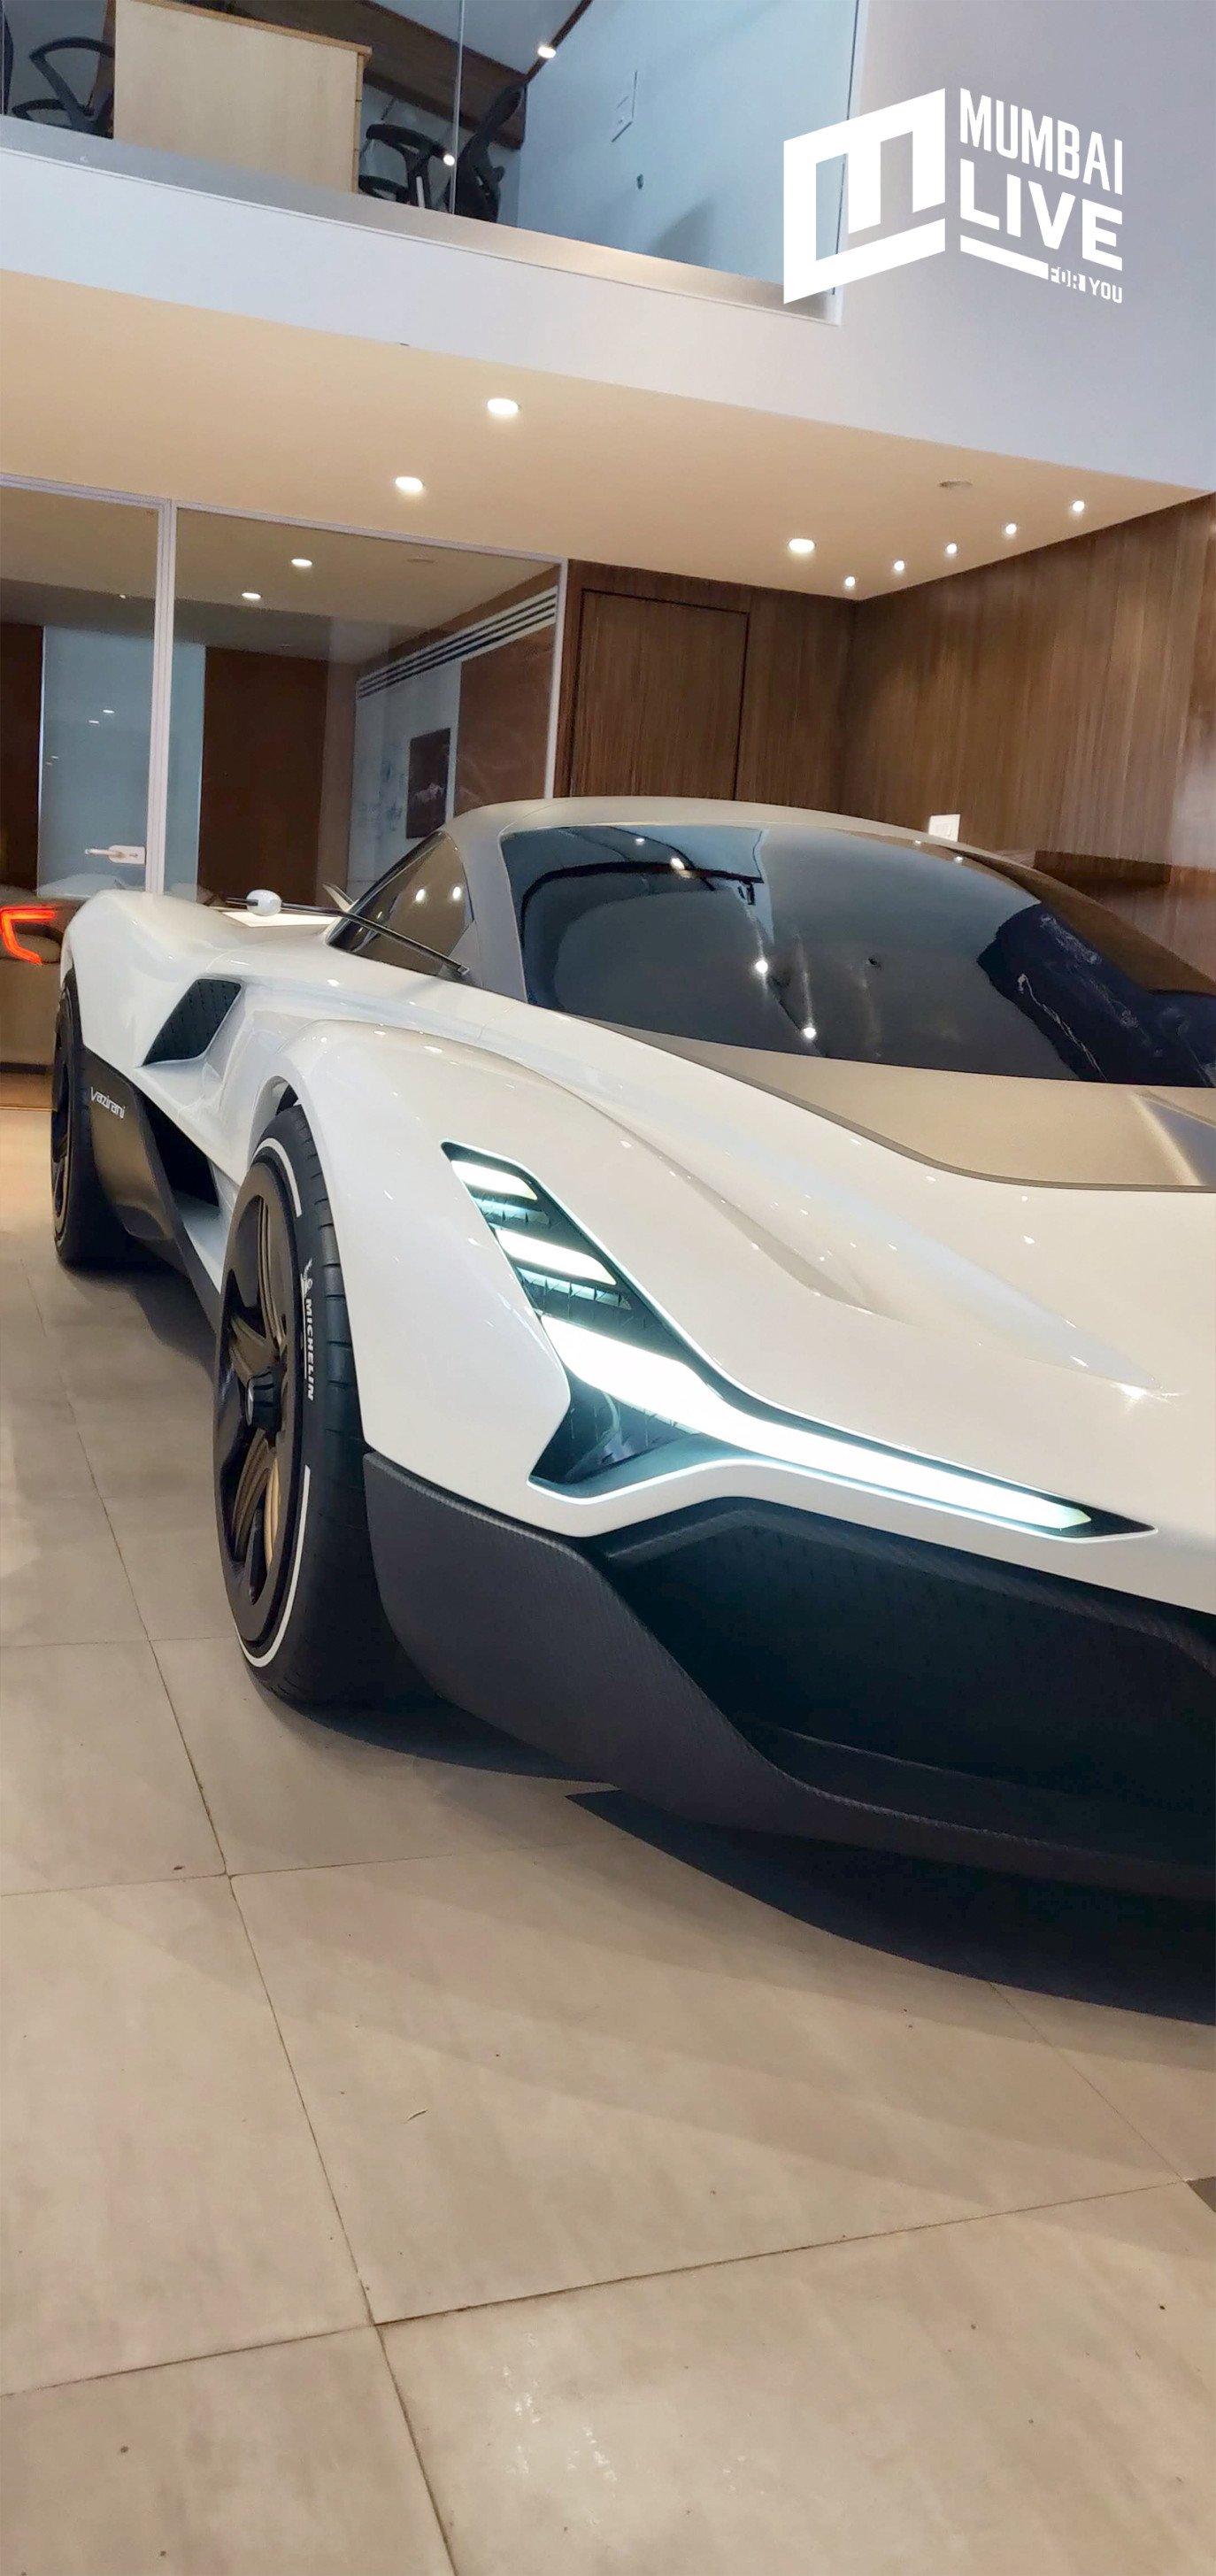 Shul — India's first hybrid hypercar